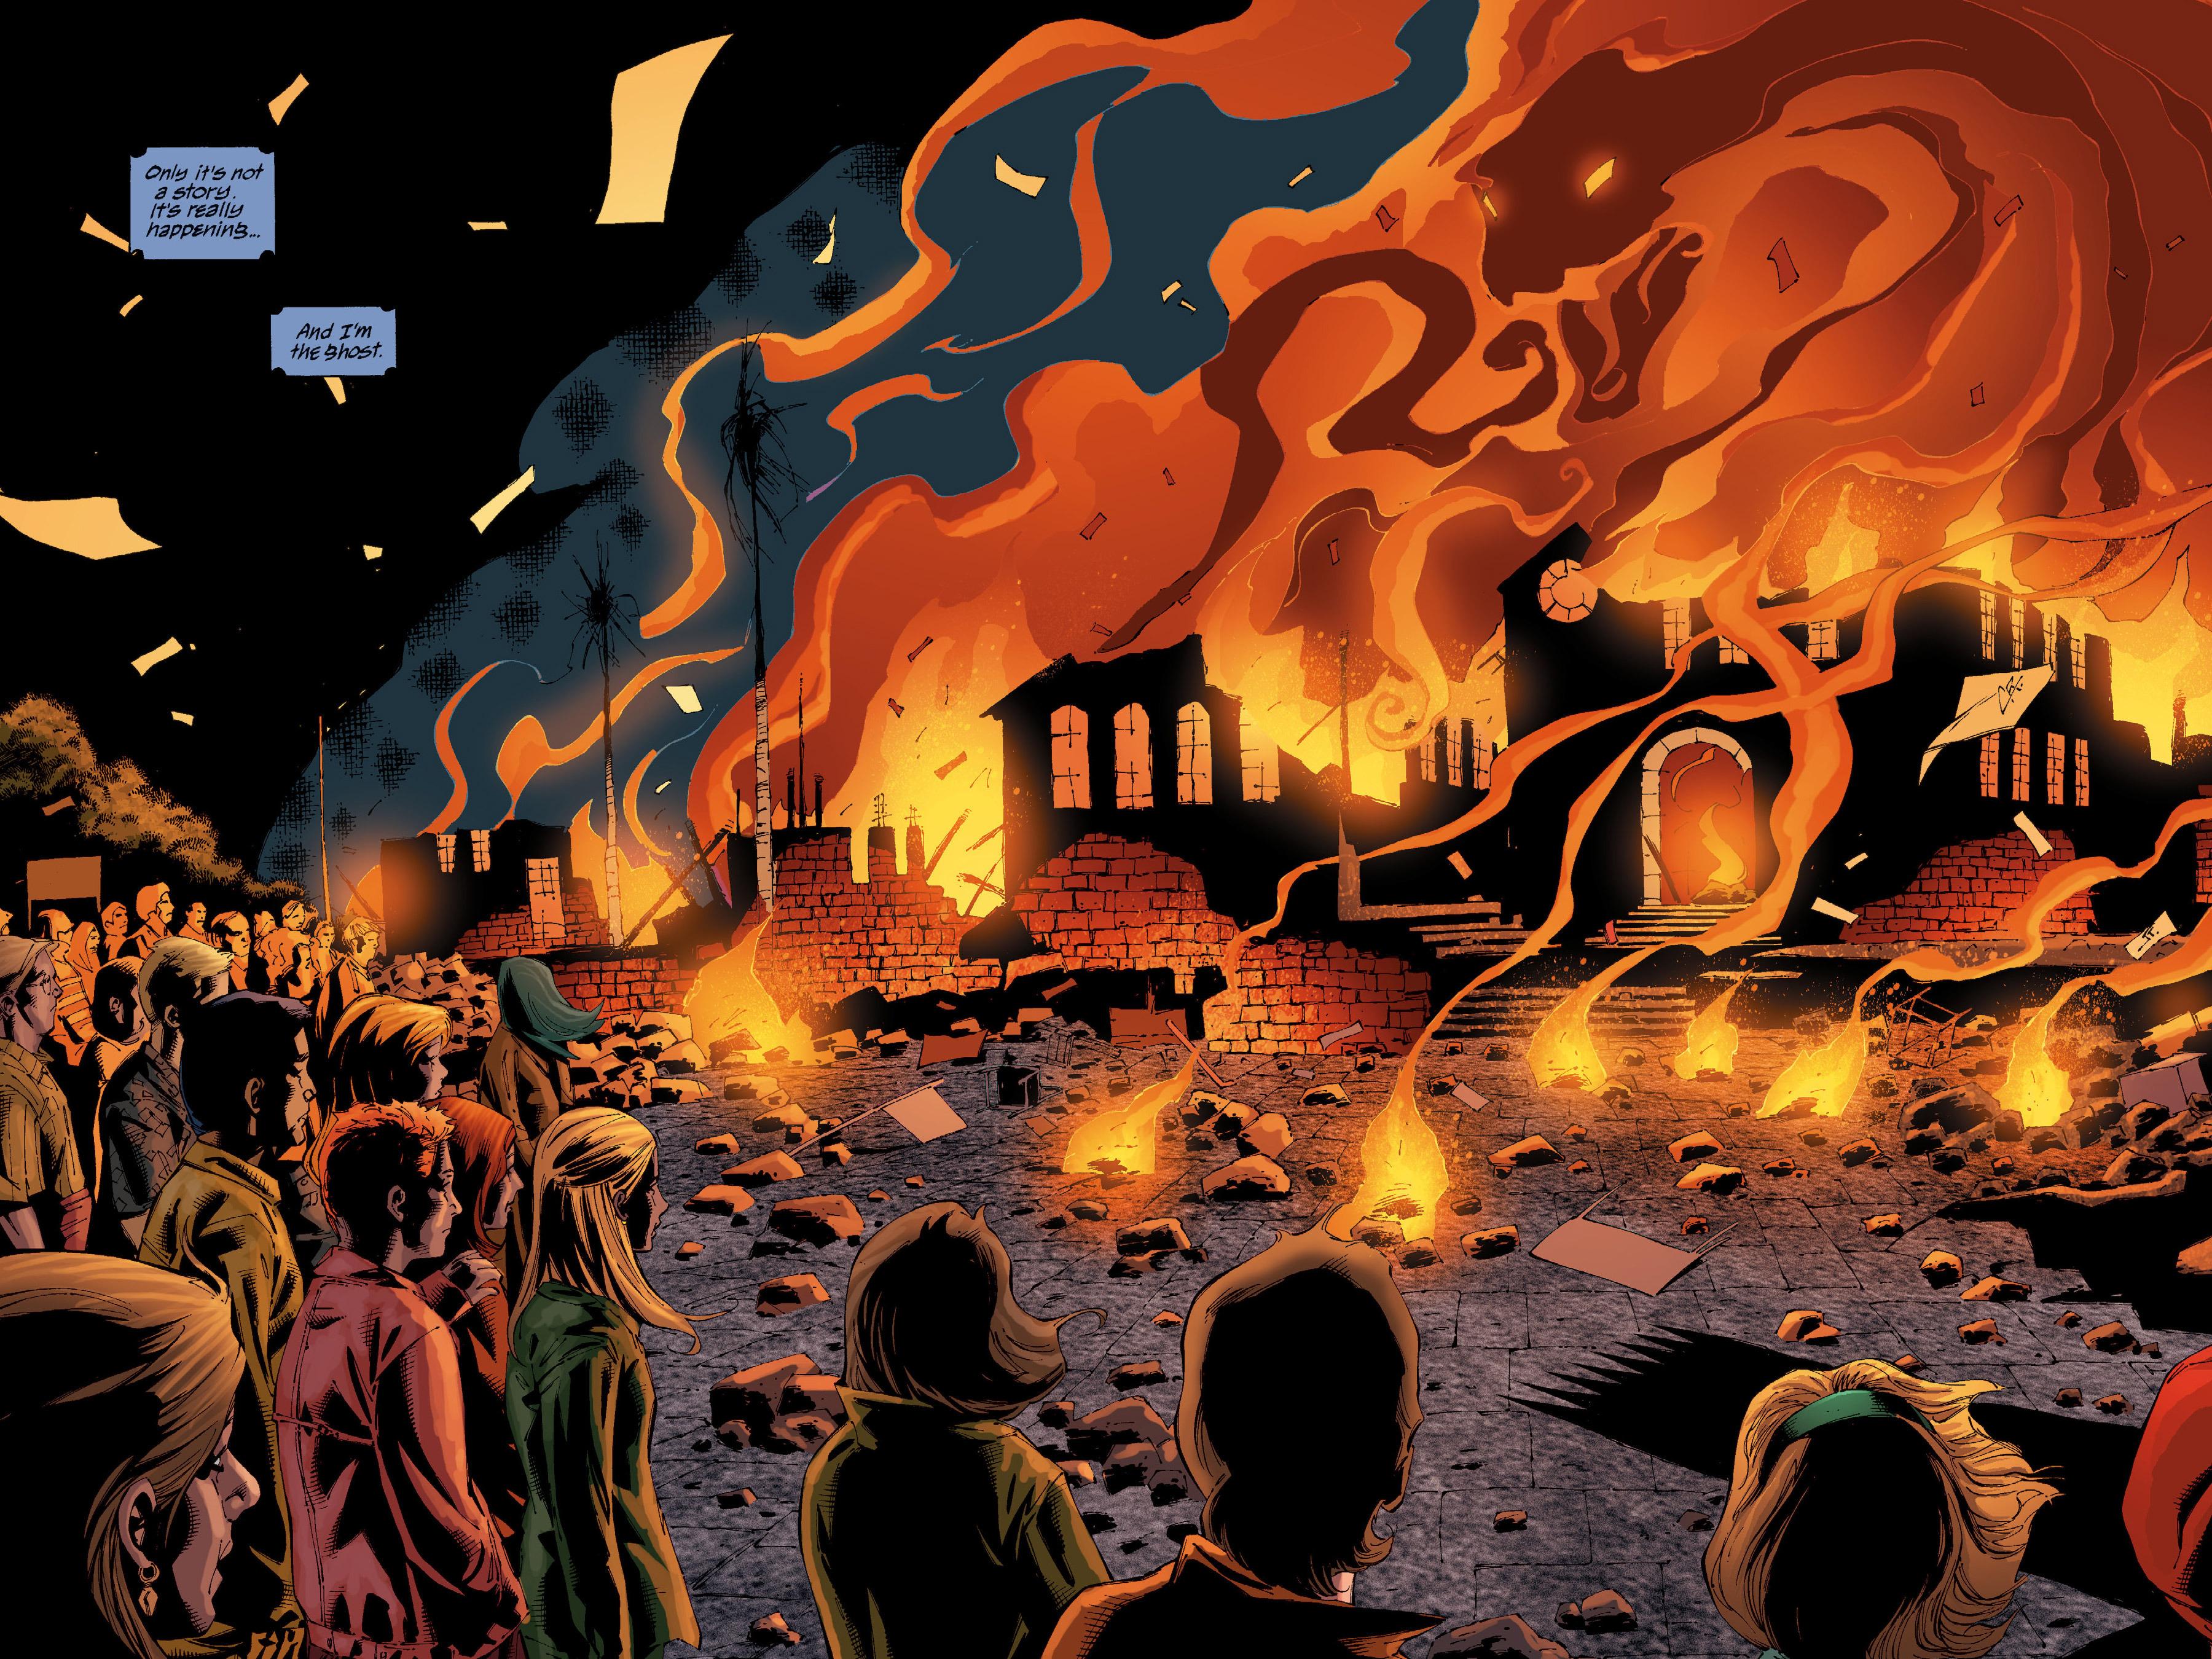 Read online Buffy the Vampire Slayer: Omnibus comic -  Issue # TPB 5 - 12